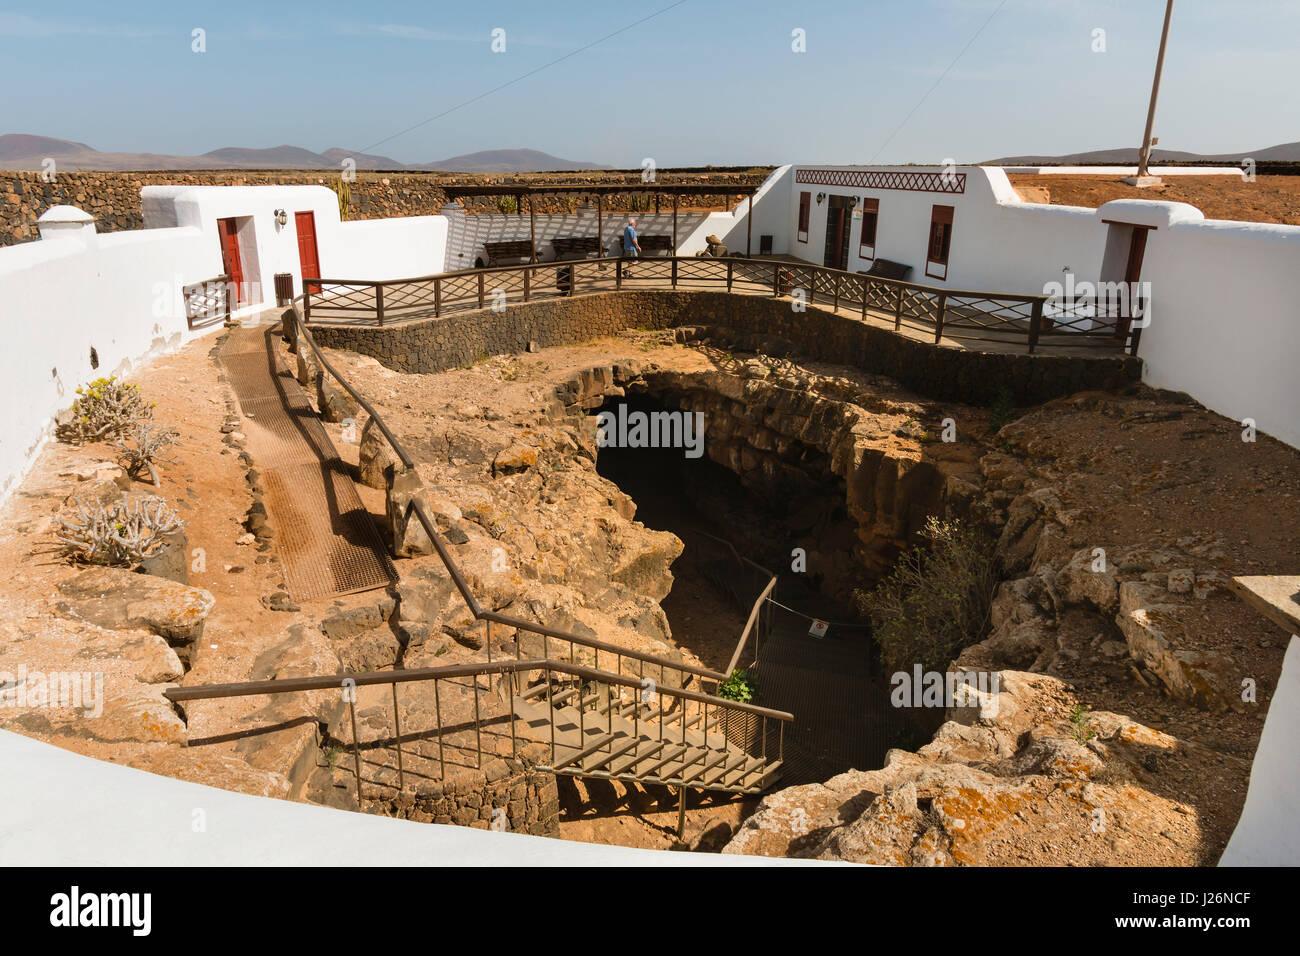 FUERTEVENTURA - SEPTEMBER 23: The entrance to the Cueva del Llano in Fuerteventura, Spain on September 23, 2015 - Stock Image